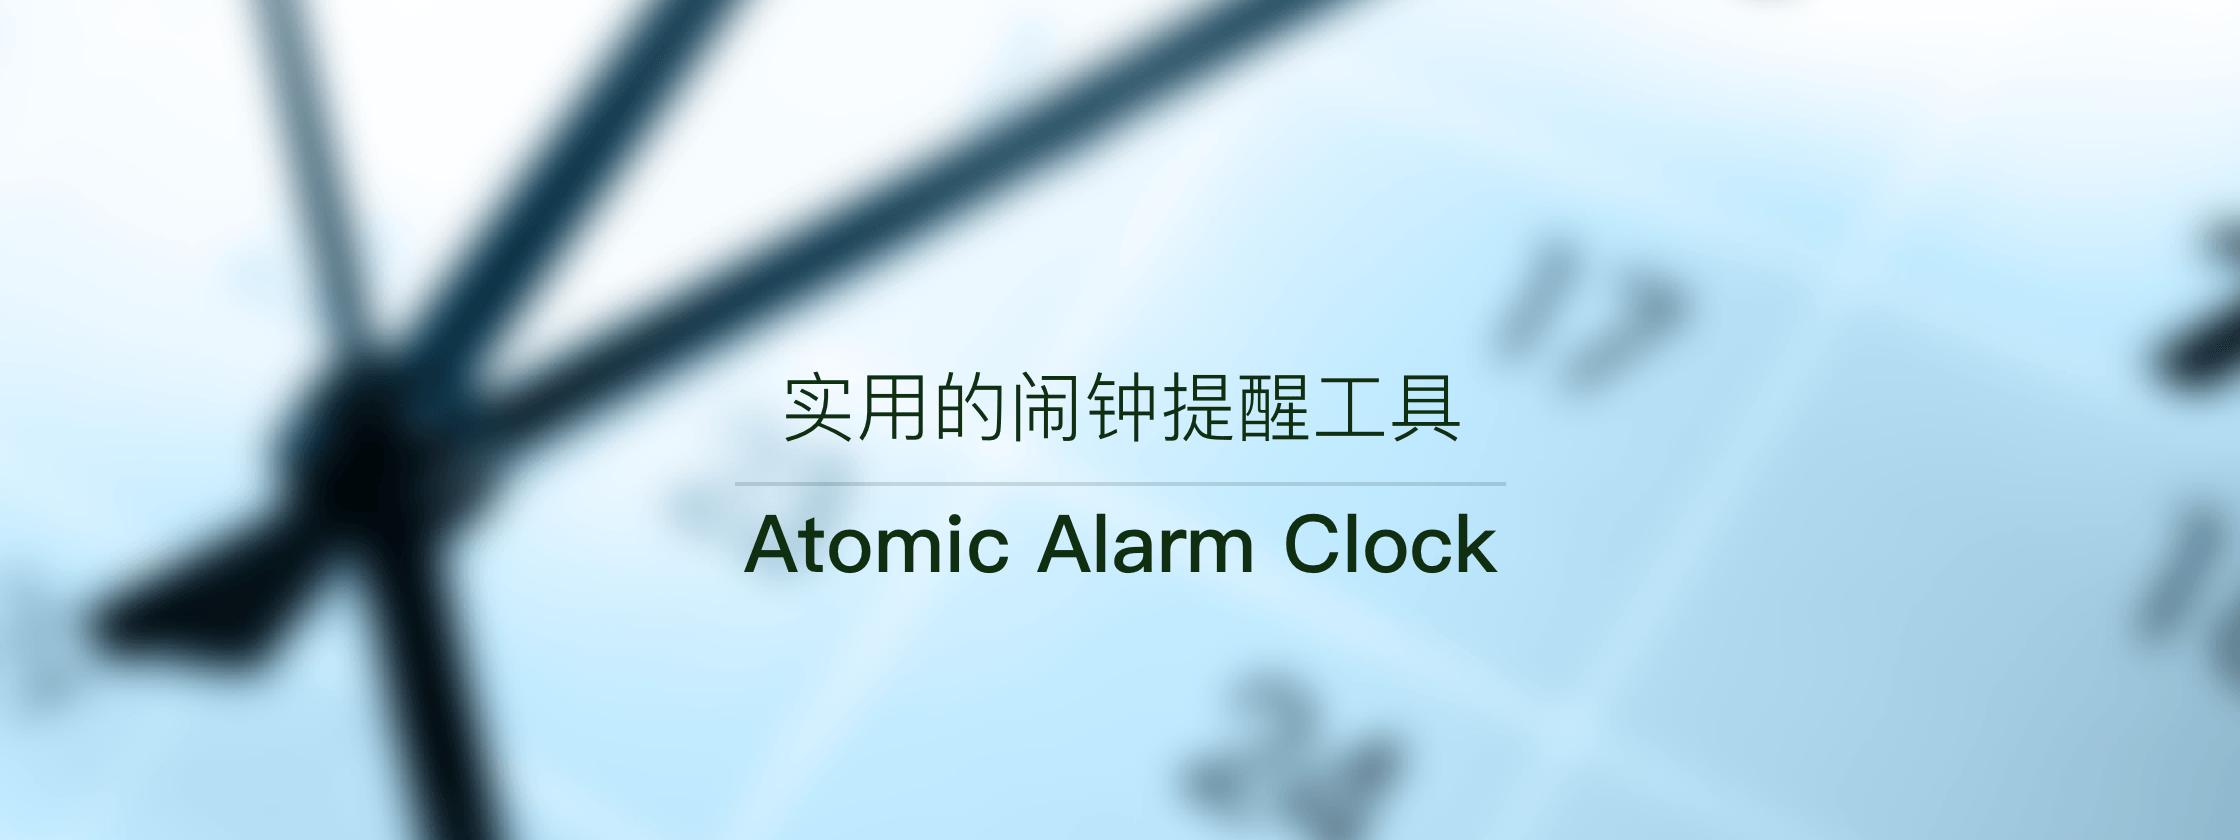 Atomic Alarm Clock – 实用的闹钟提醒工具